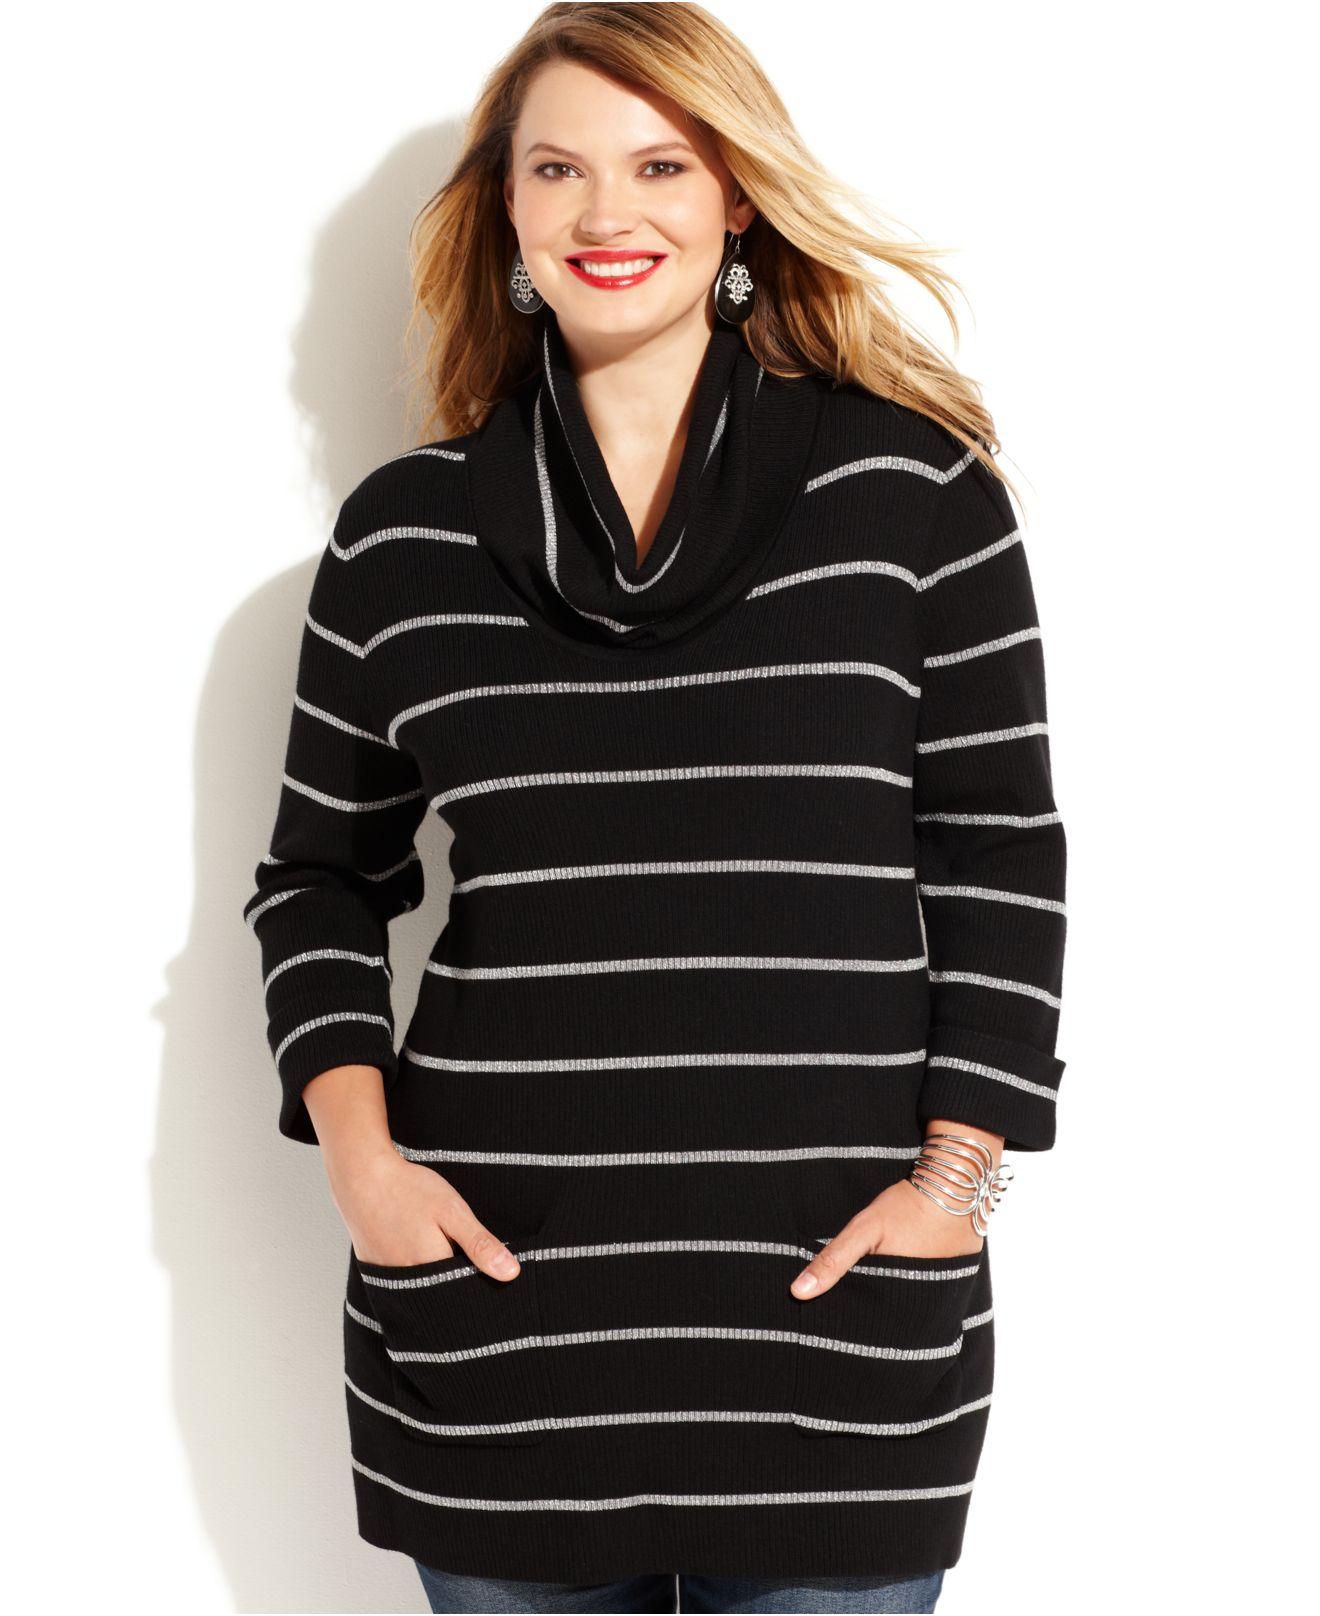 Inc international concepts Plus Size Striped Cowl-Neck Tunic ...